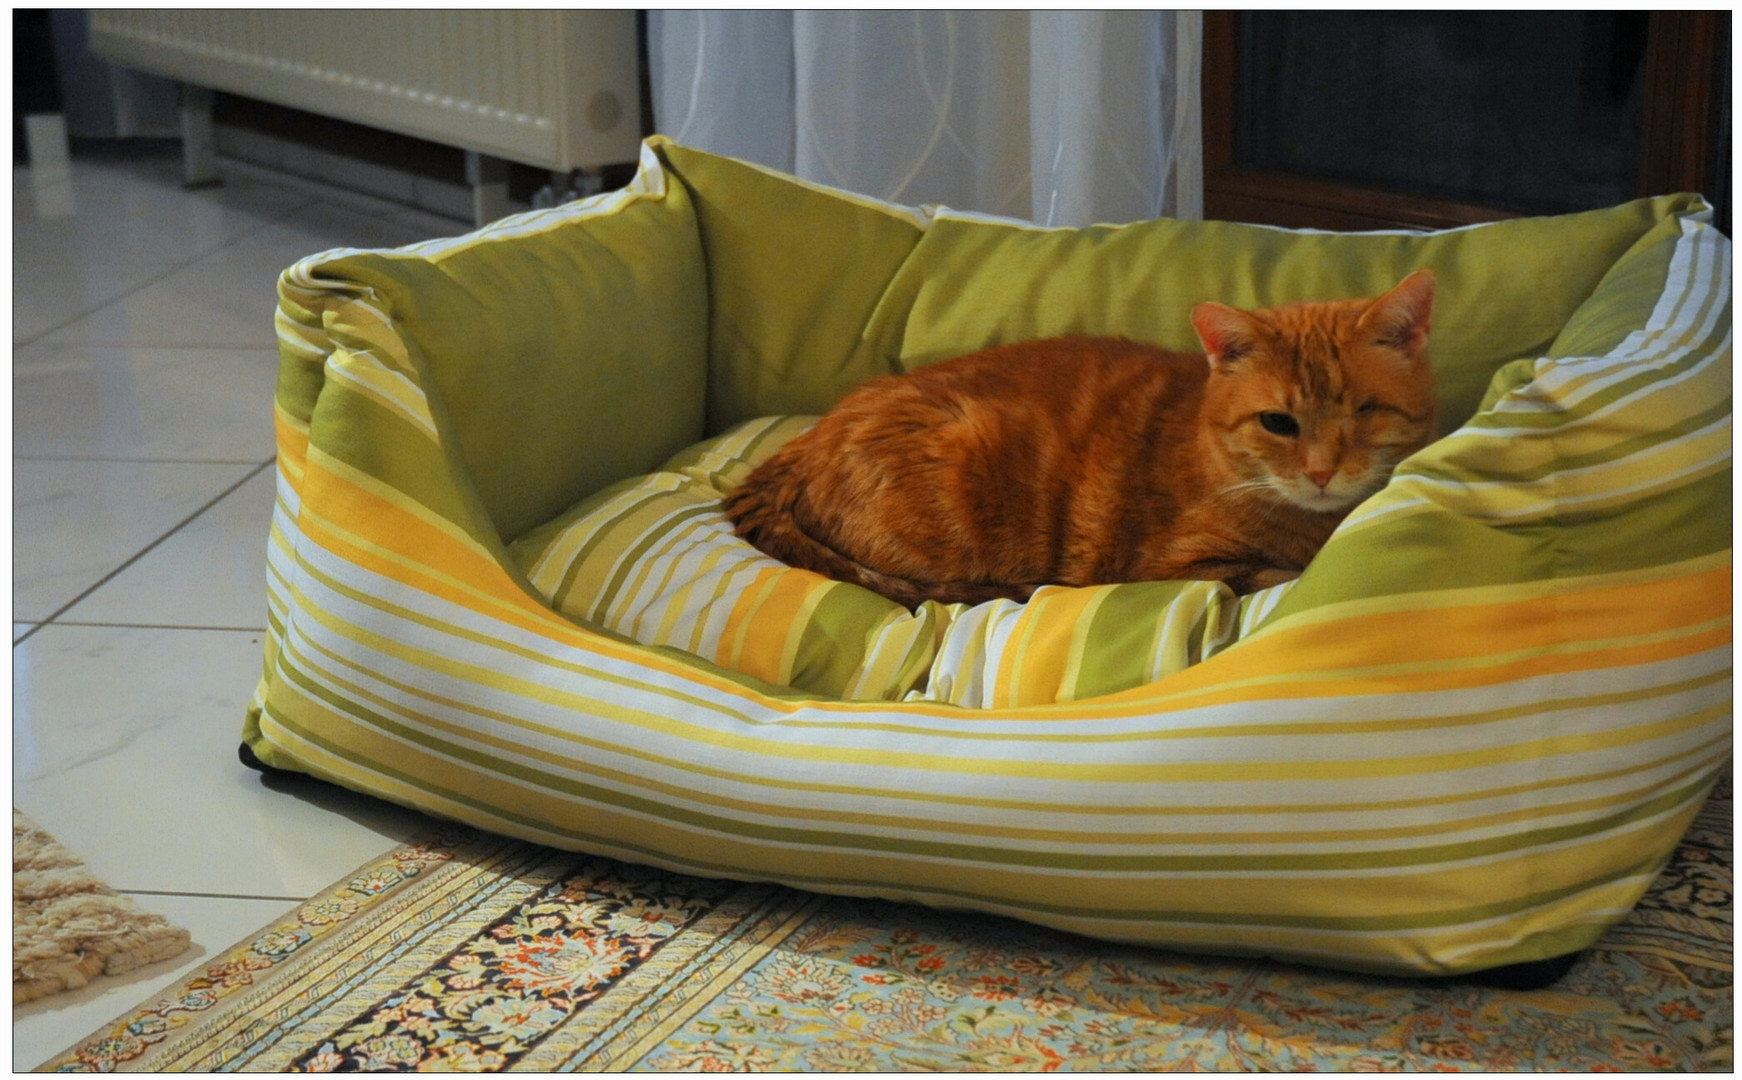 Das neue Bett für Wicky - Emily (la nueva cama para Wicky -Emily)